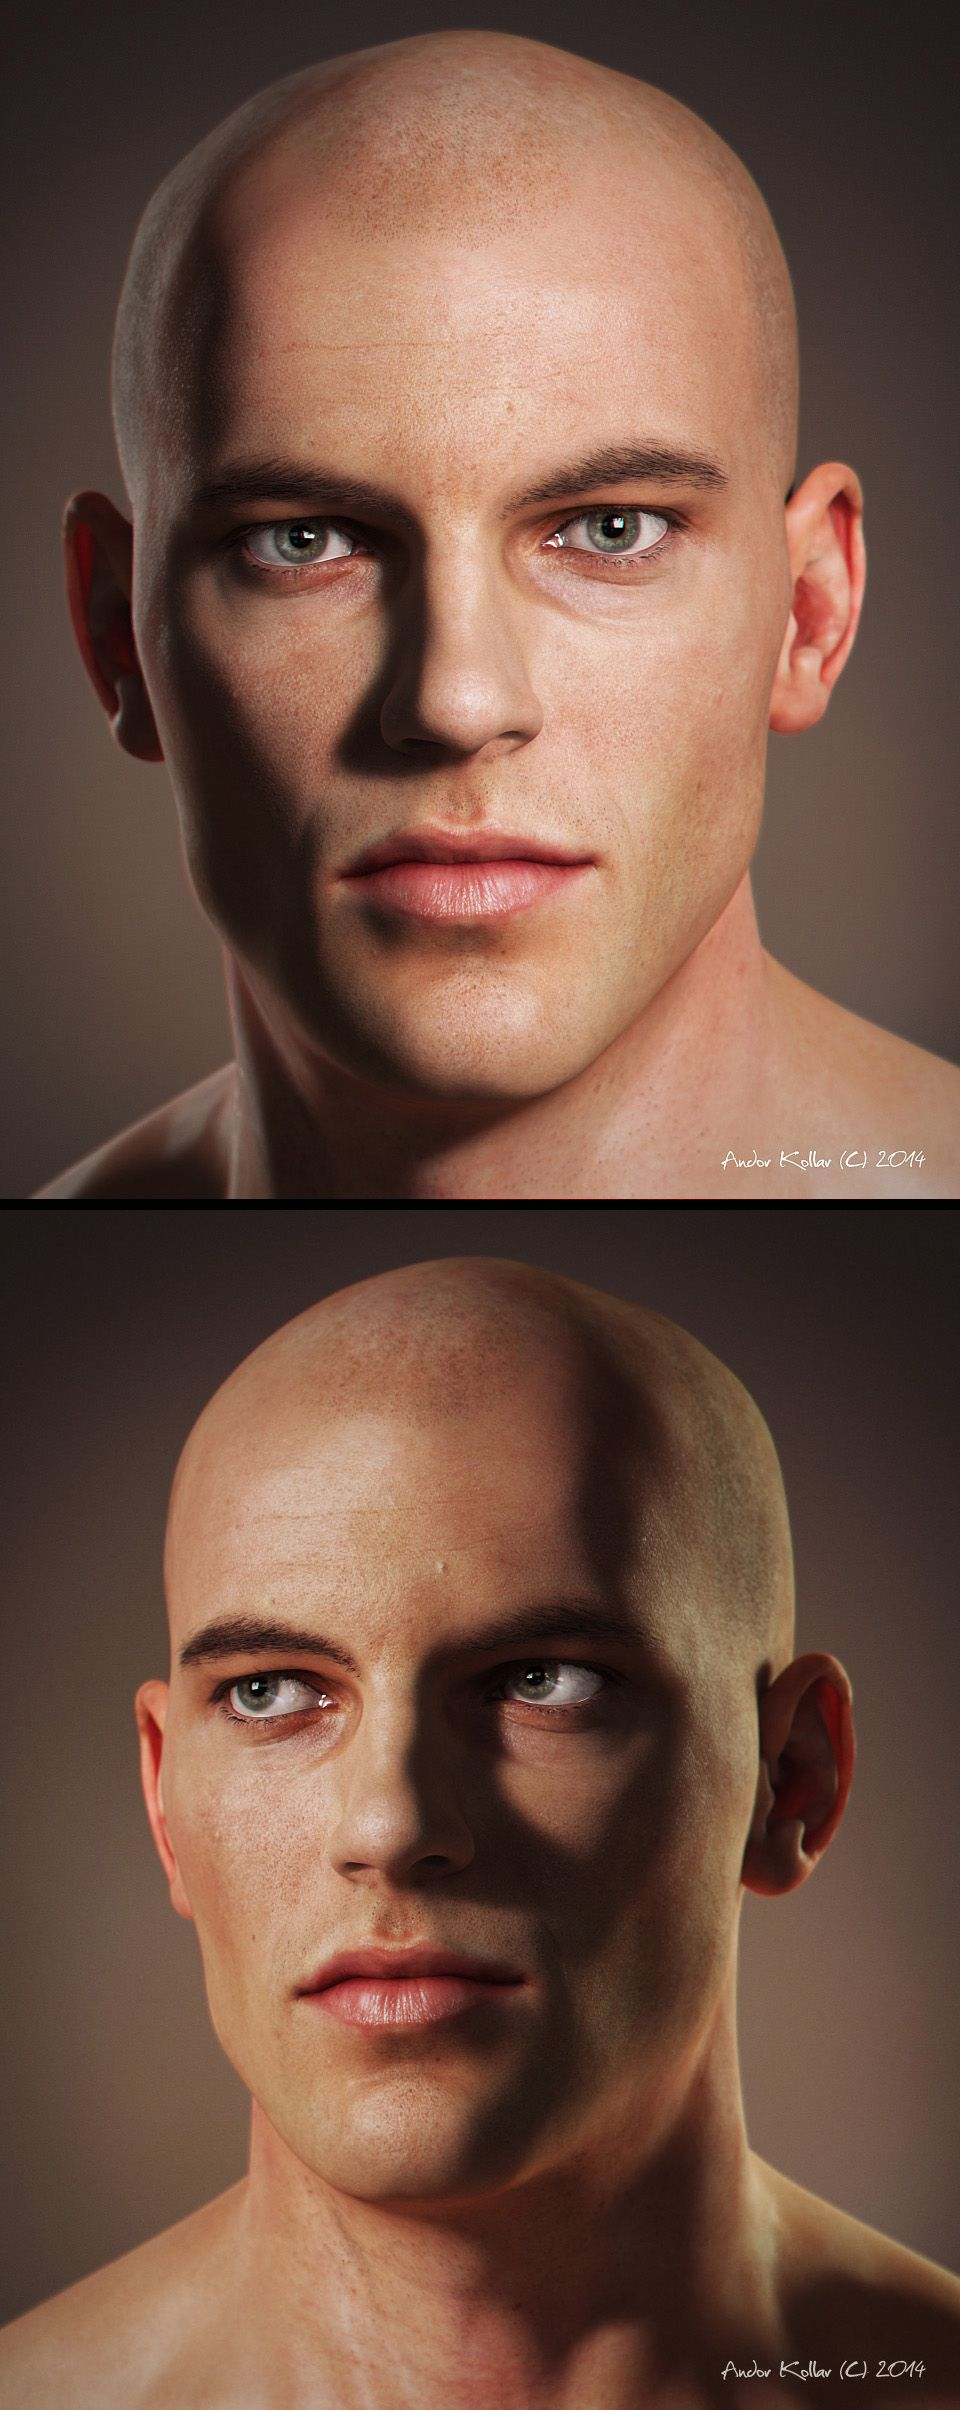 Male Head by Andor Kollar 960px X 2410px